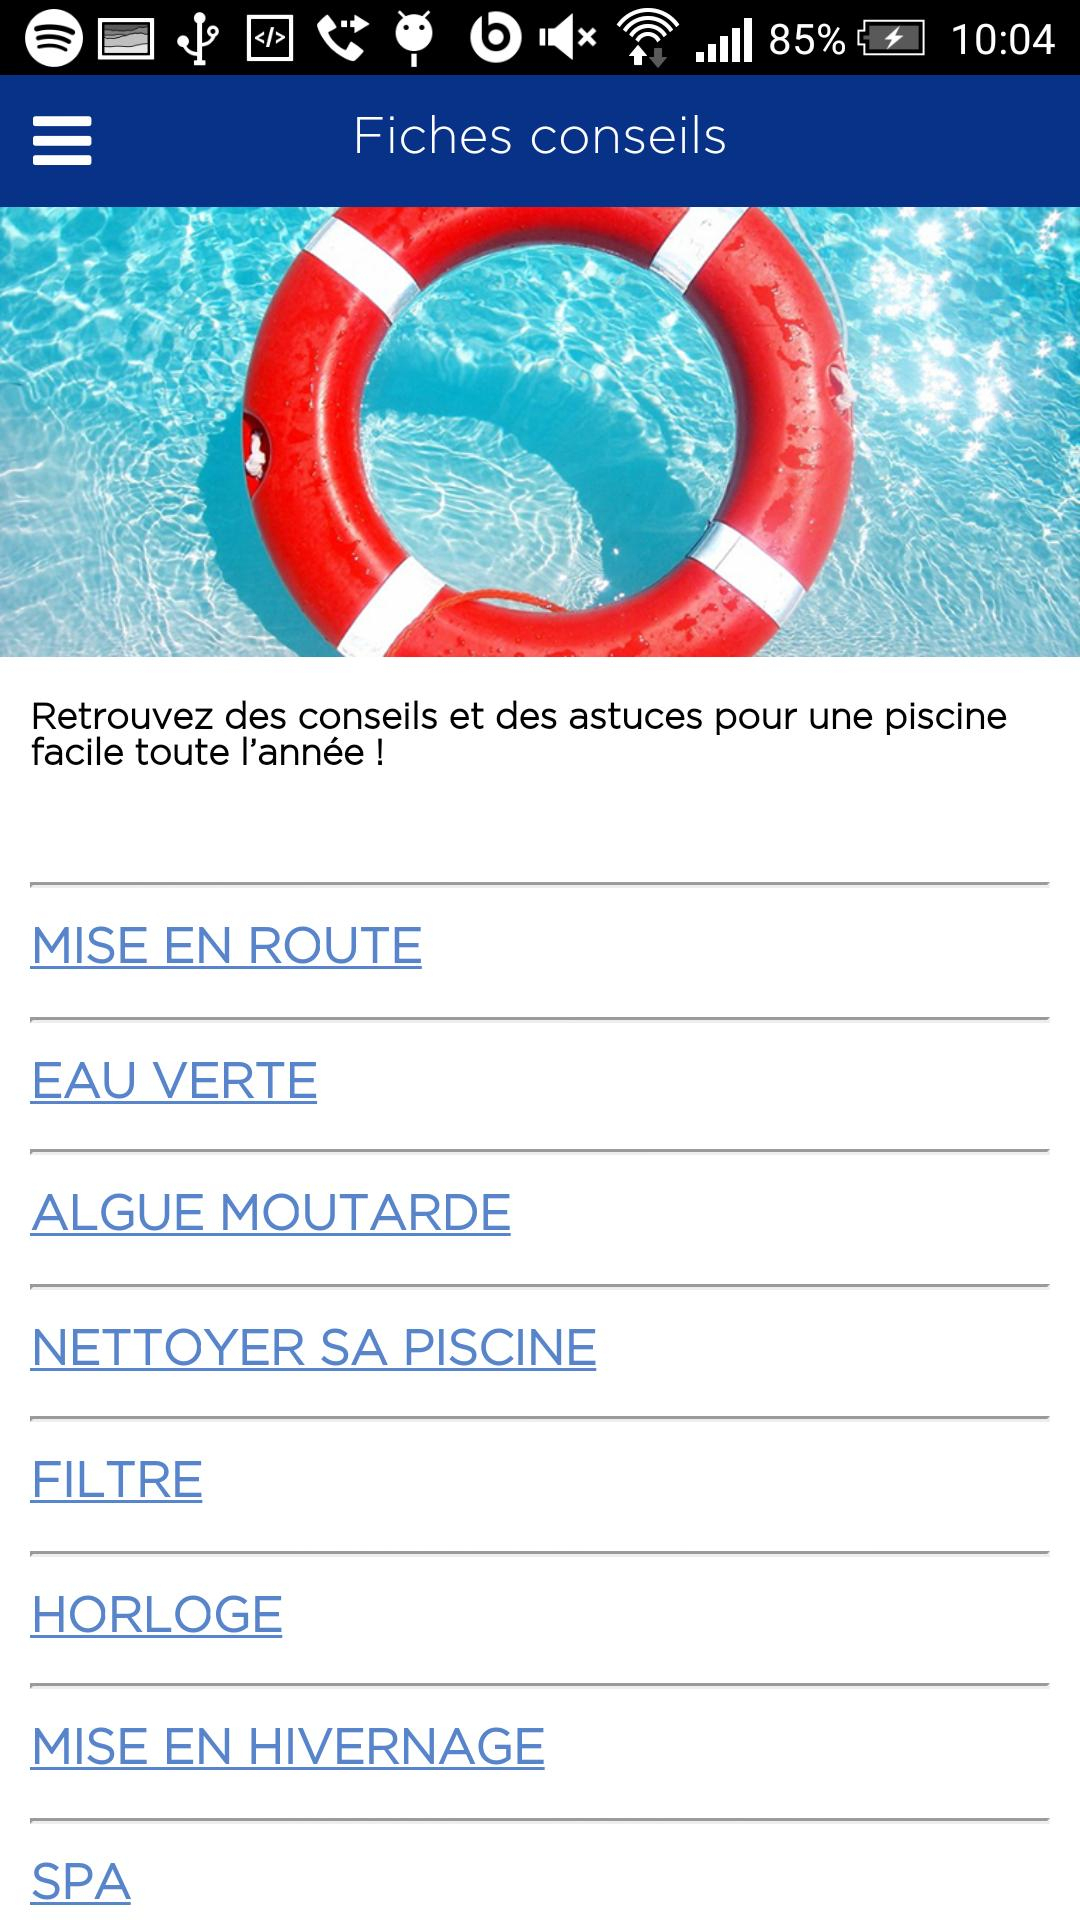 Piscine Plus For Android - Apk Download serapportantà Piscine Plus Le Cres